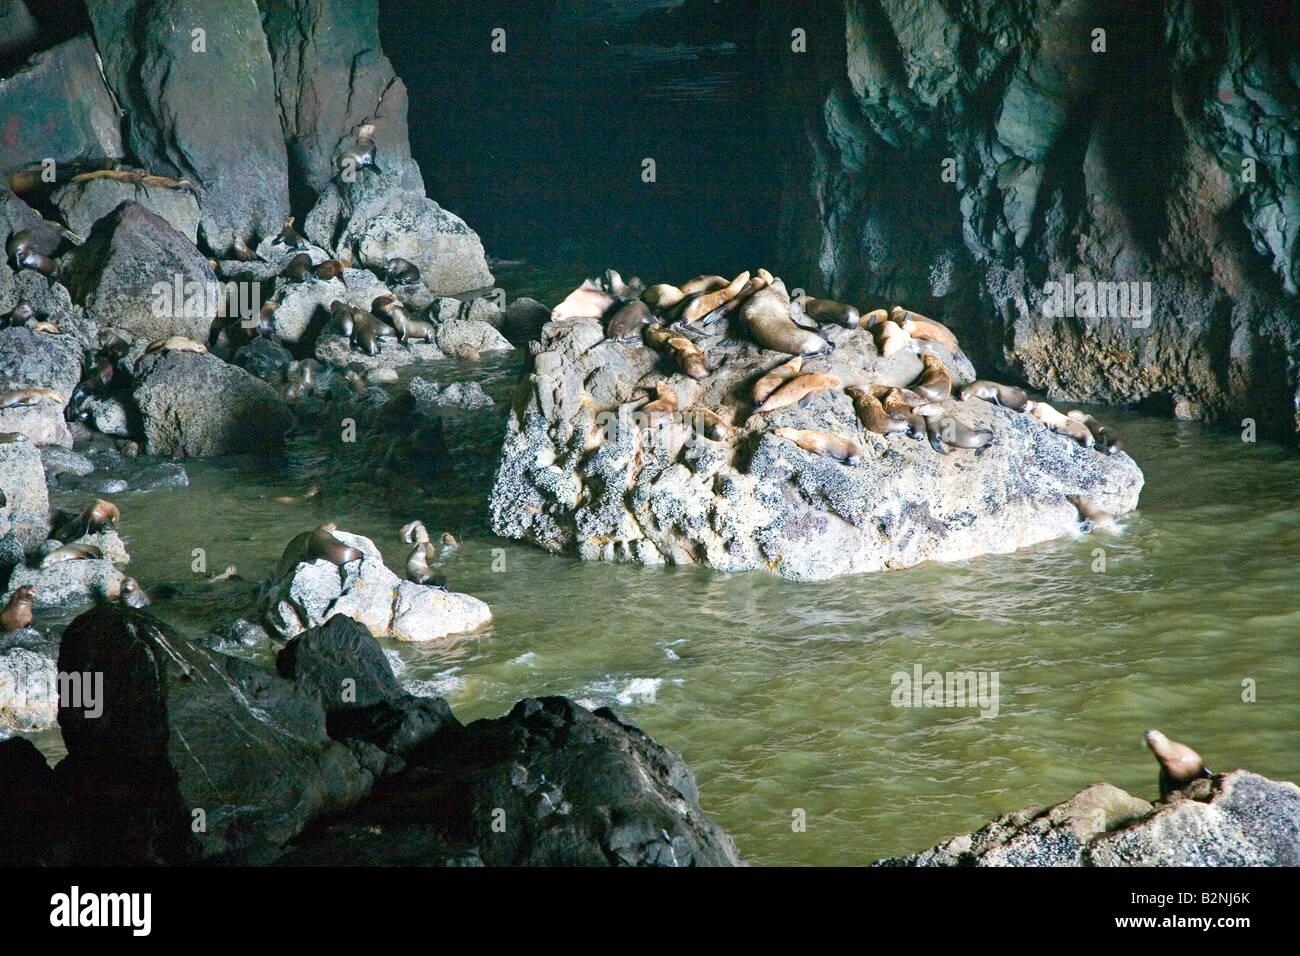 Sea Lion Caves Oregon Stock Photos & Sea Lion Caves Oregon ...